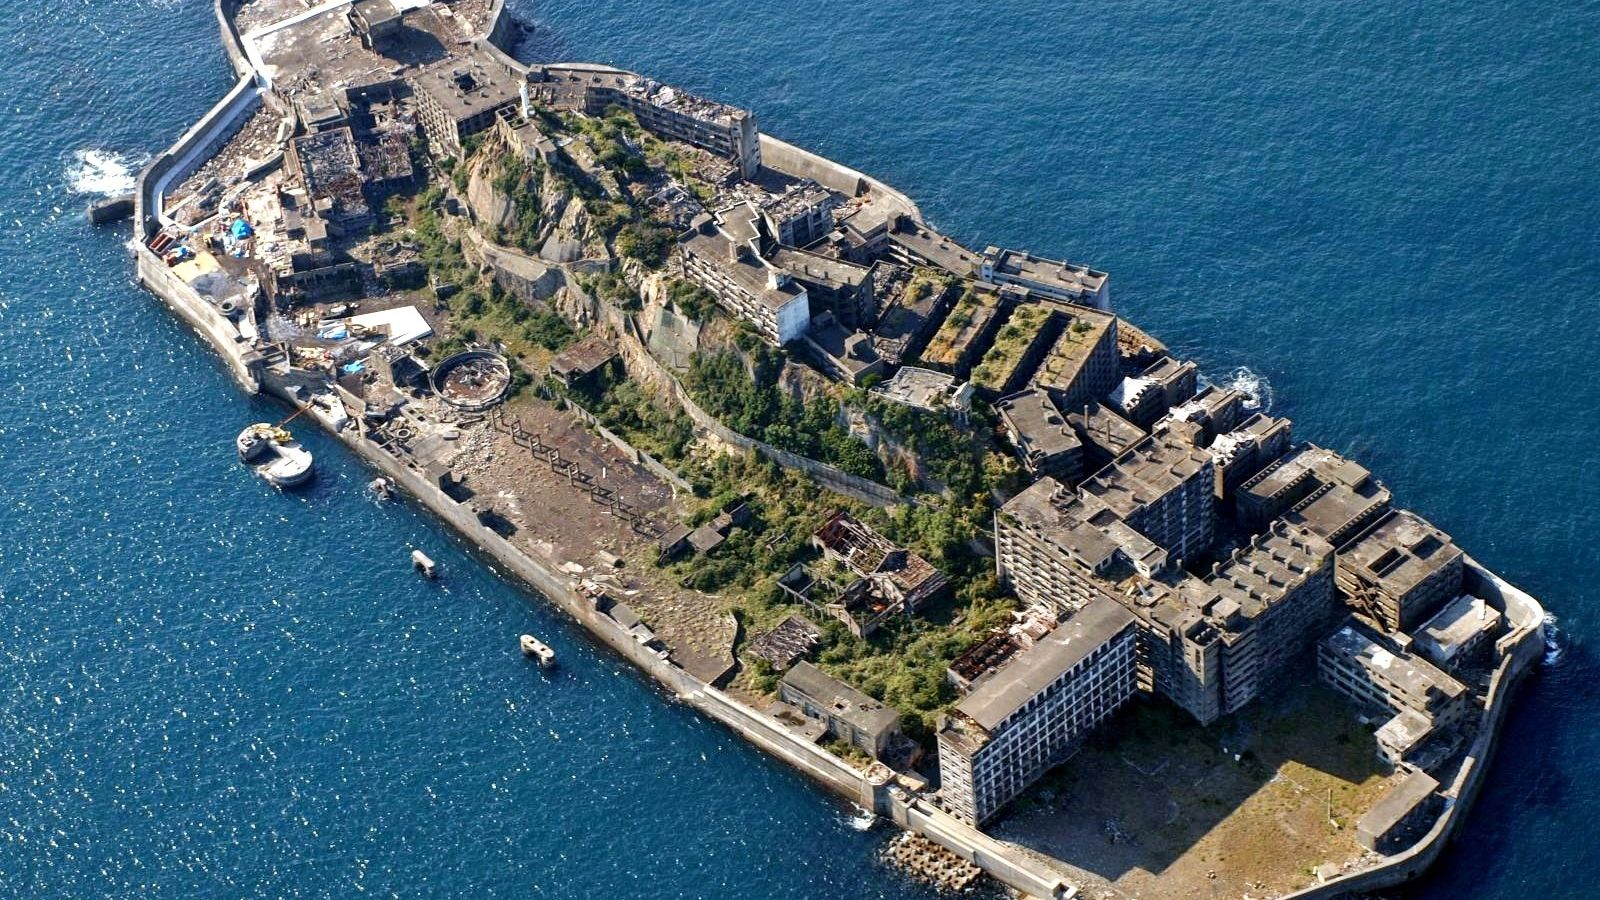 Vista aérea da Ilha de Hashima.